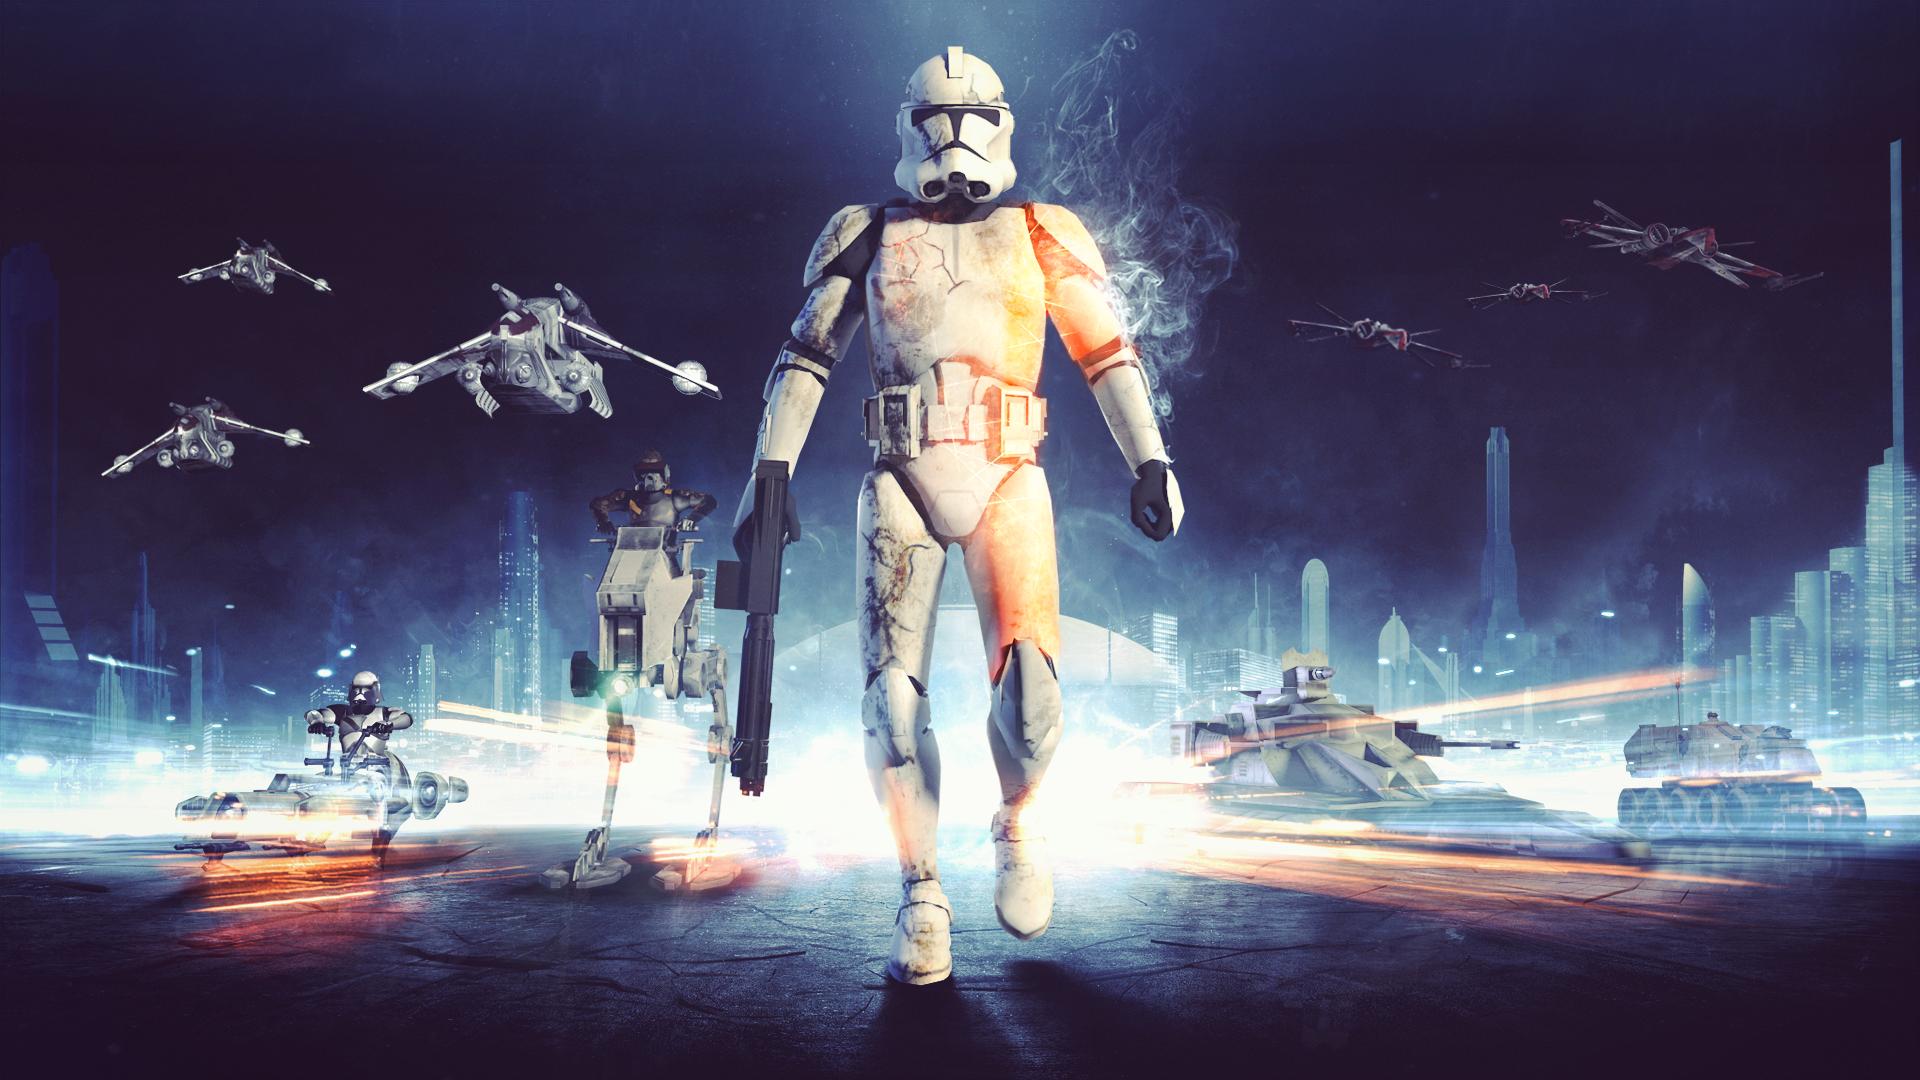 Battlefield 4 Full Hd Fond D écran And Arrière Plan: Battlefront Battlefield Fond D'écran HD